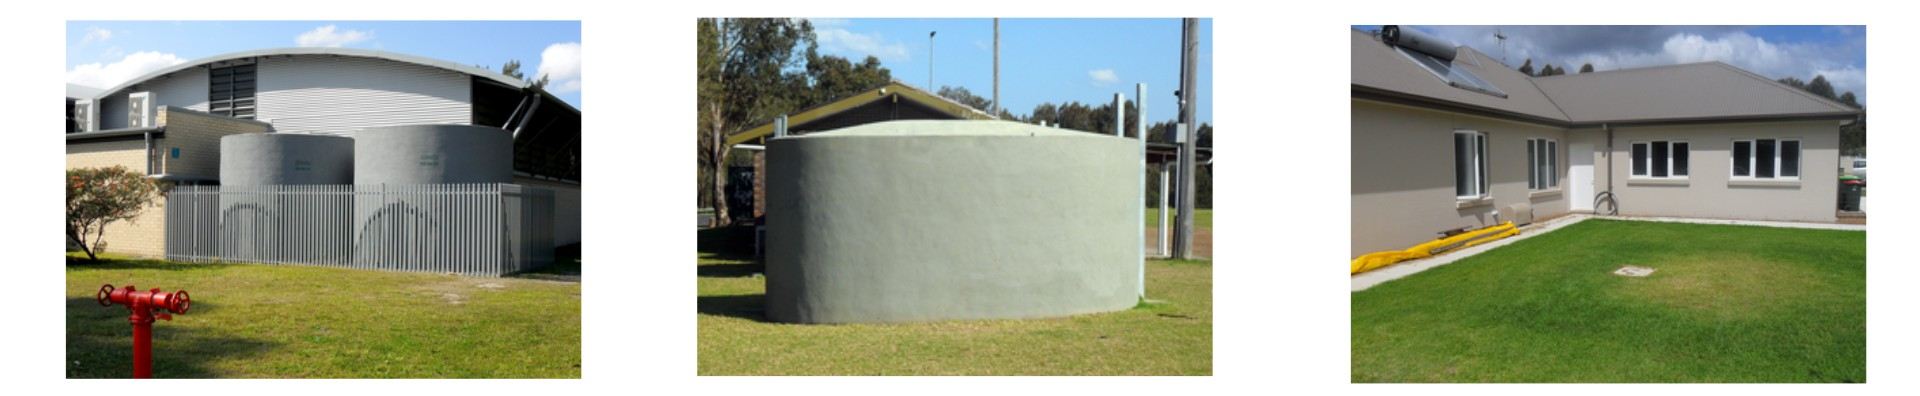 concrete-tanks